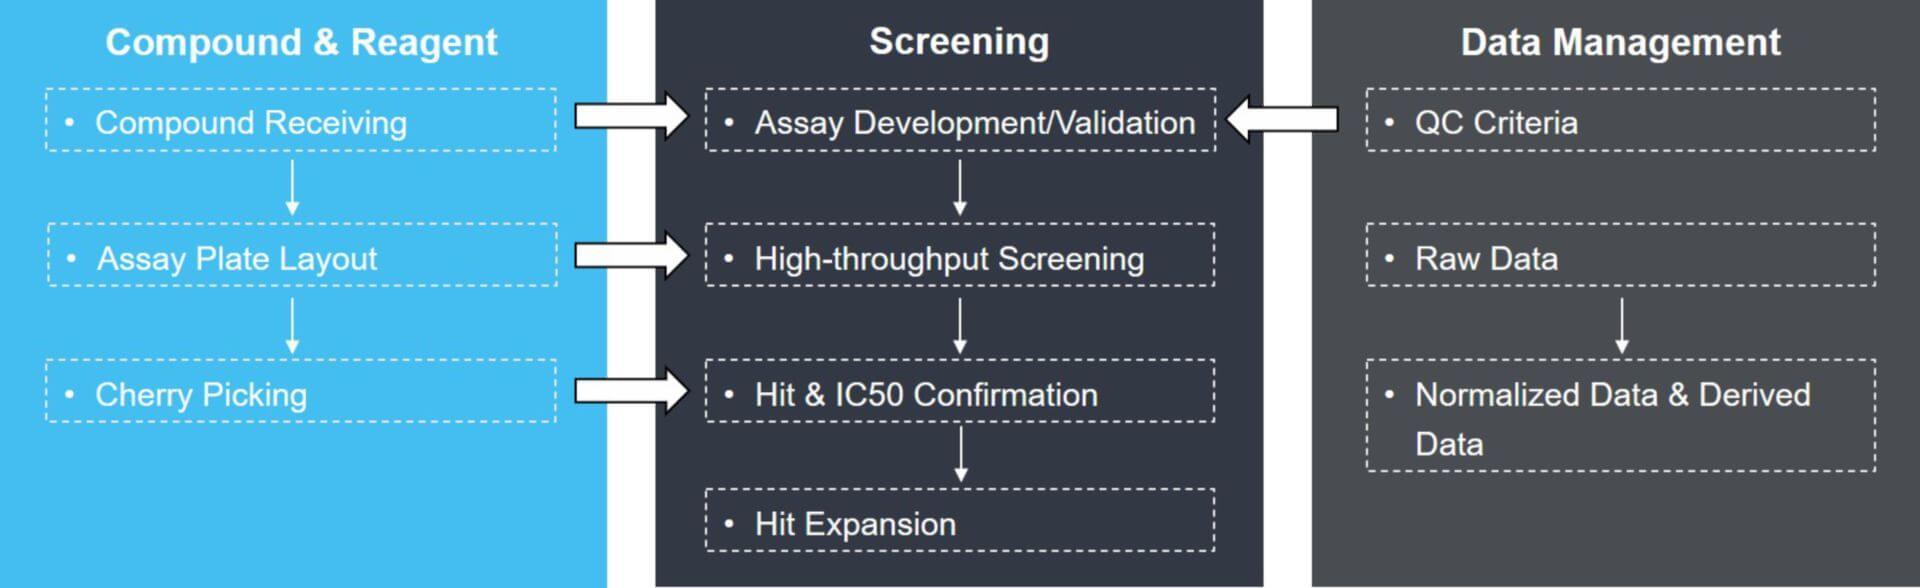 high throughput screening cro